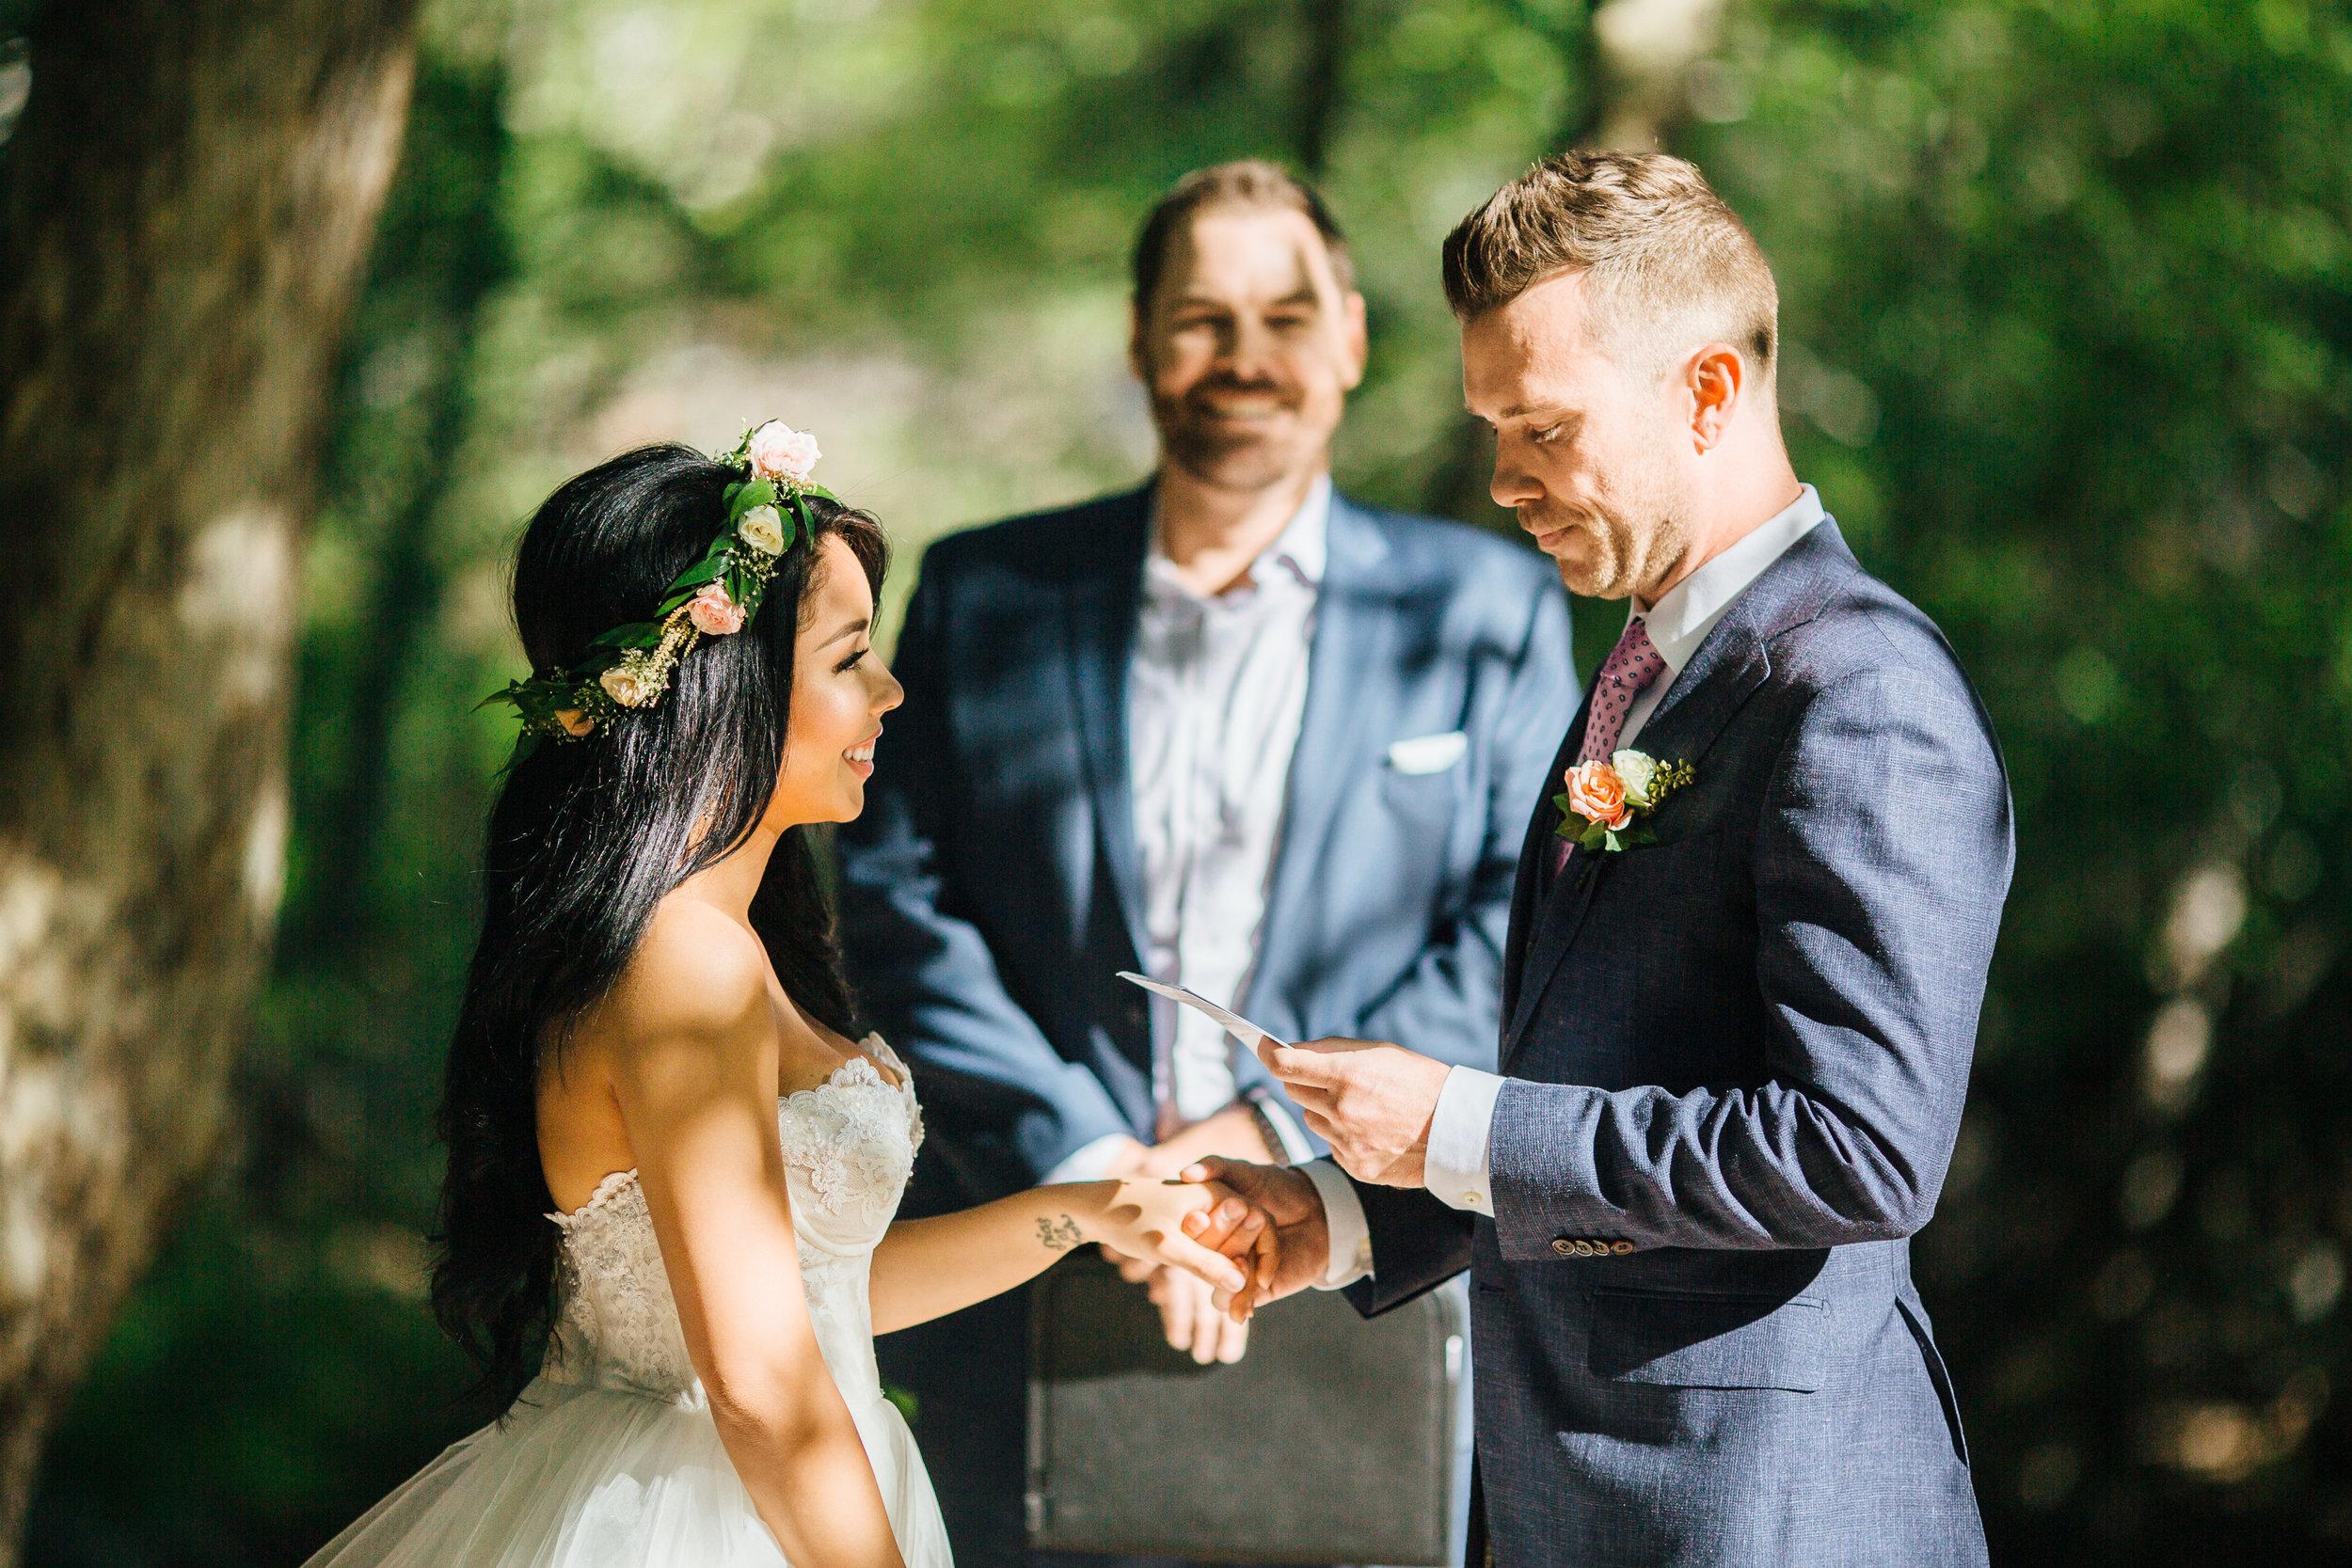 LMW-Sedona-lauberge-wedding-5391.jpg